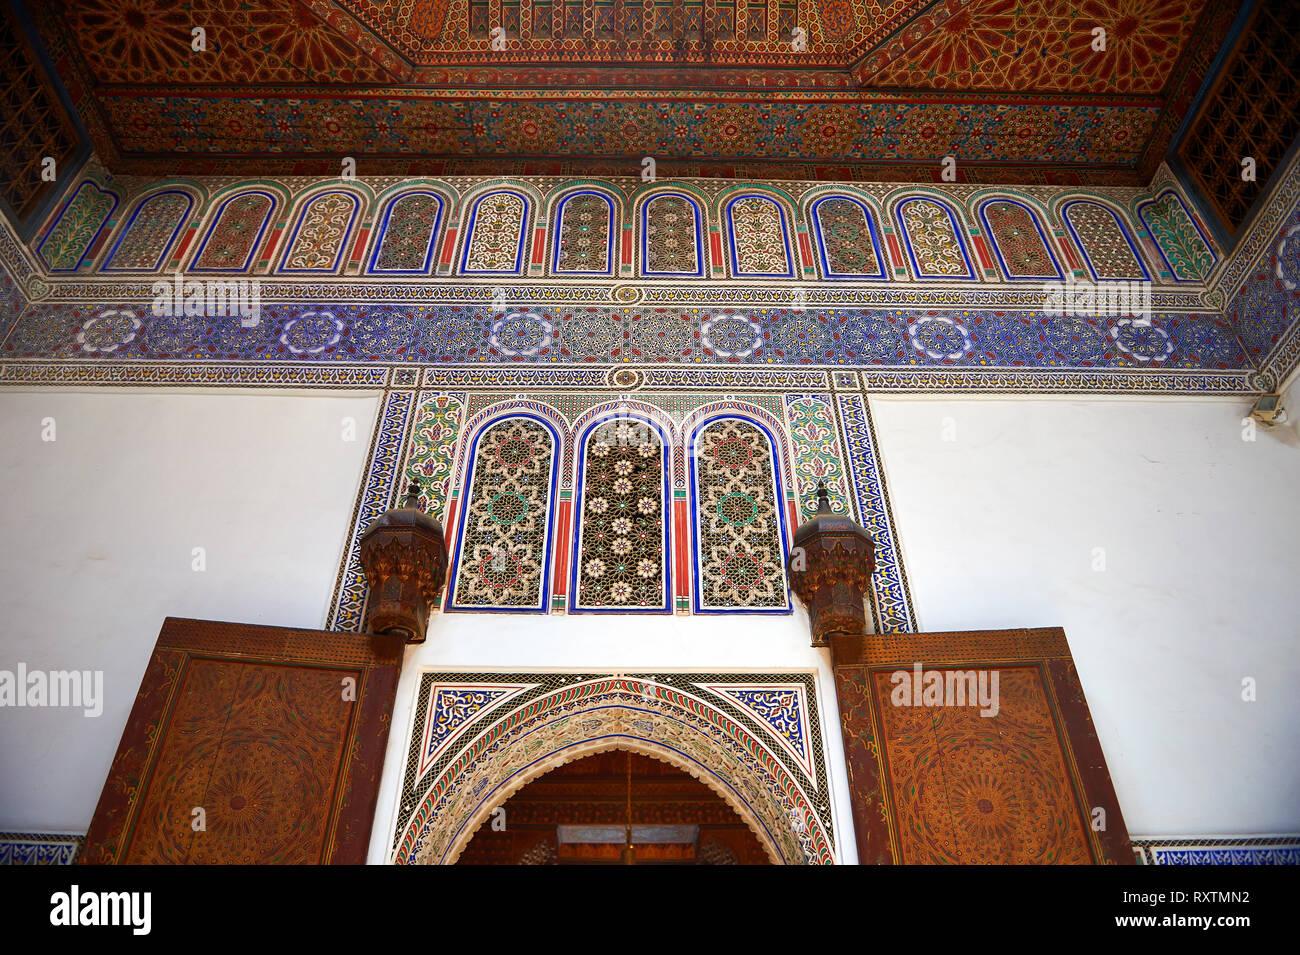 Berber arabesque doors of  the Petite Court, Bahia Palace, Marrakesh, Morroco - Stock Image